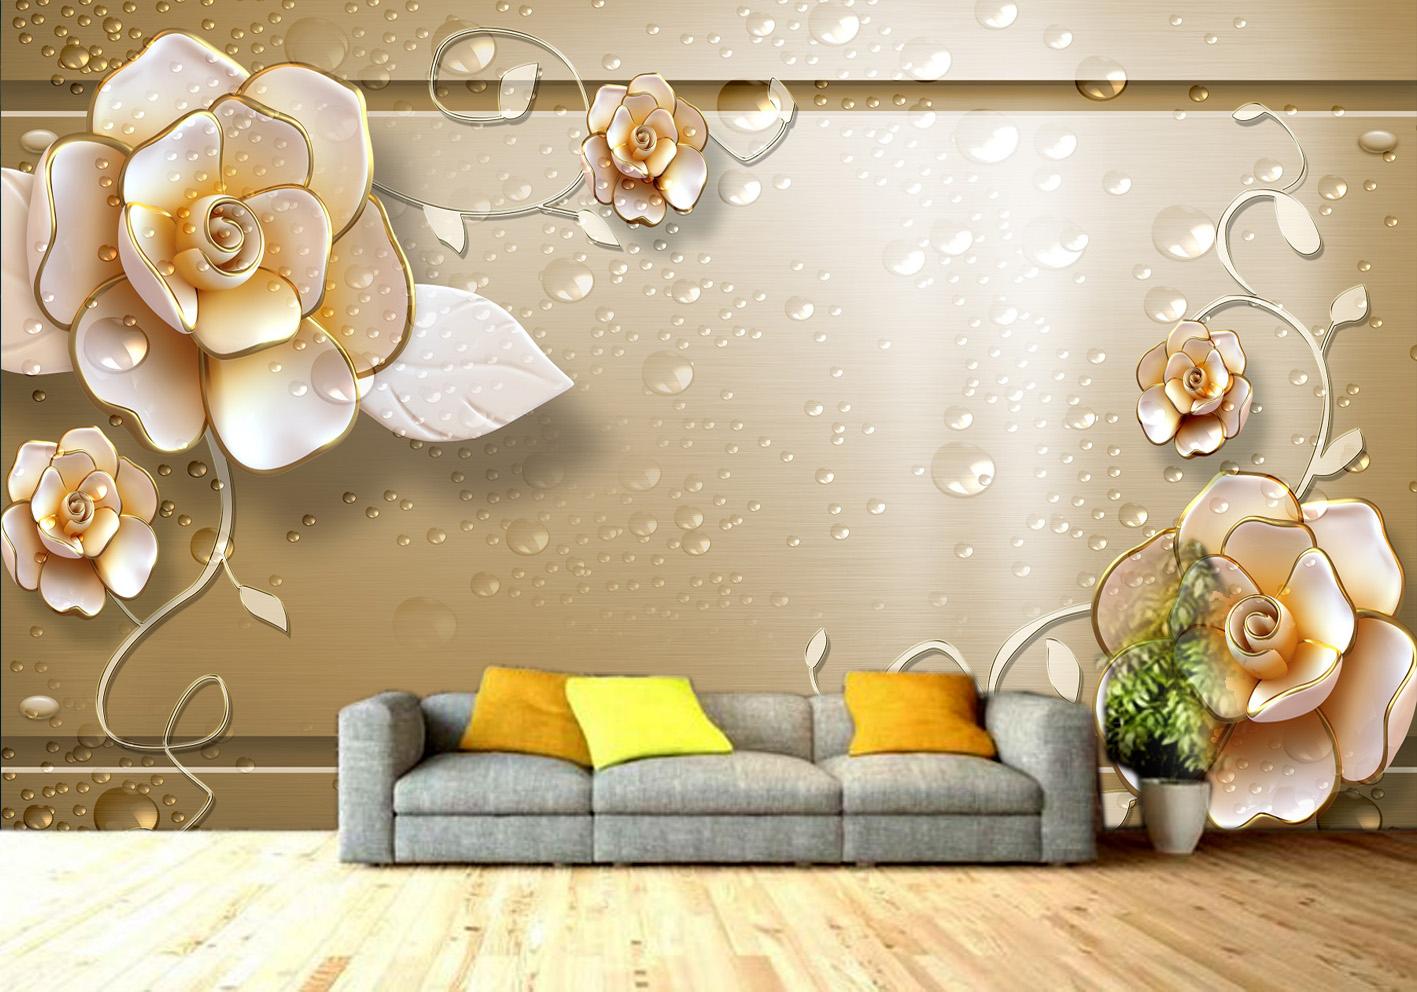 Brown Gold 3d Floral Custom Photomural Wallpaper Dcwm000543